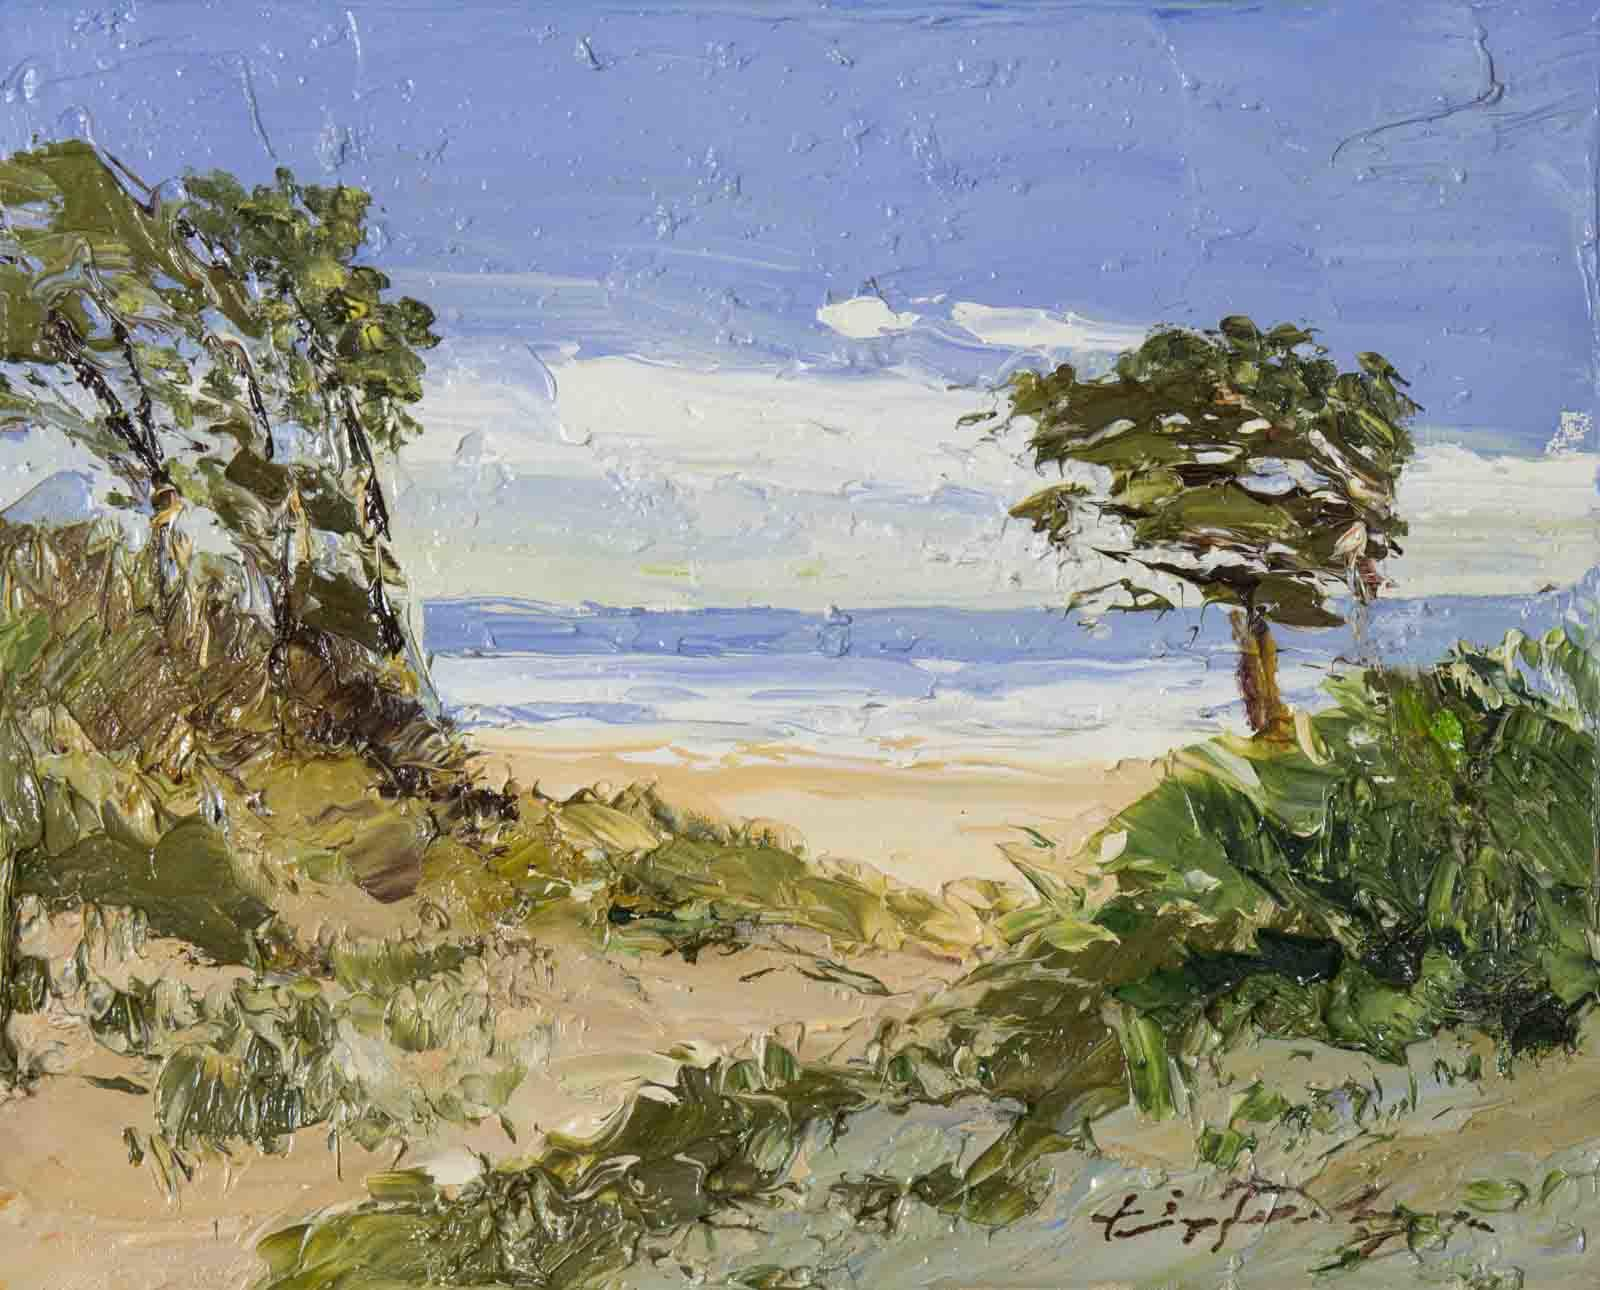 Windswept, Erich Paulsen